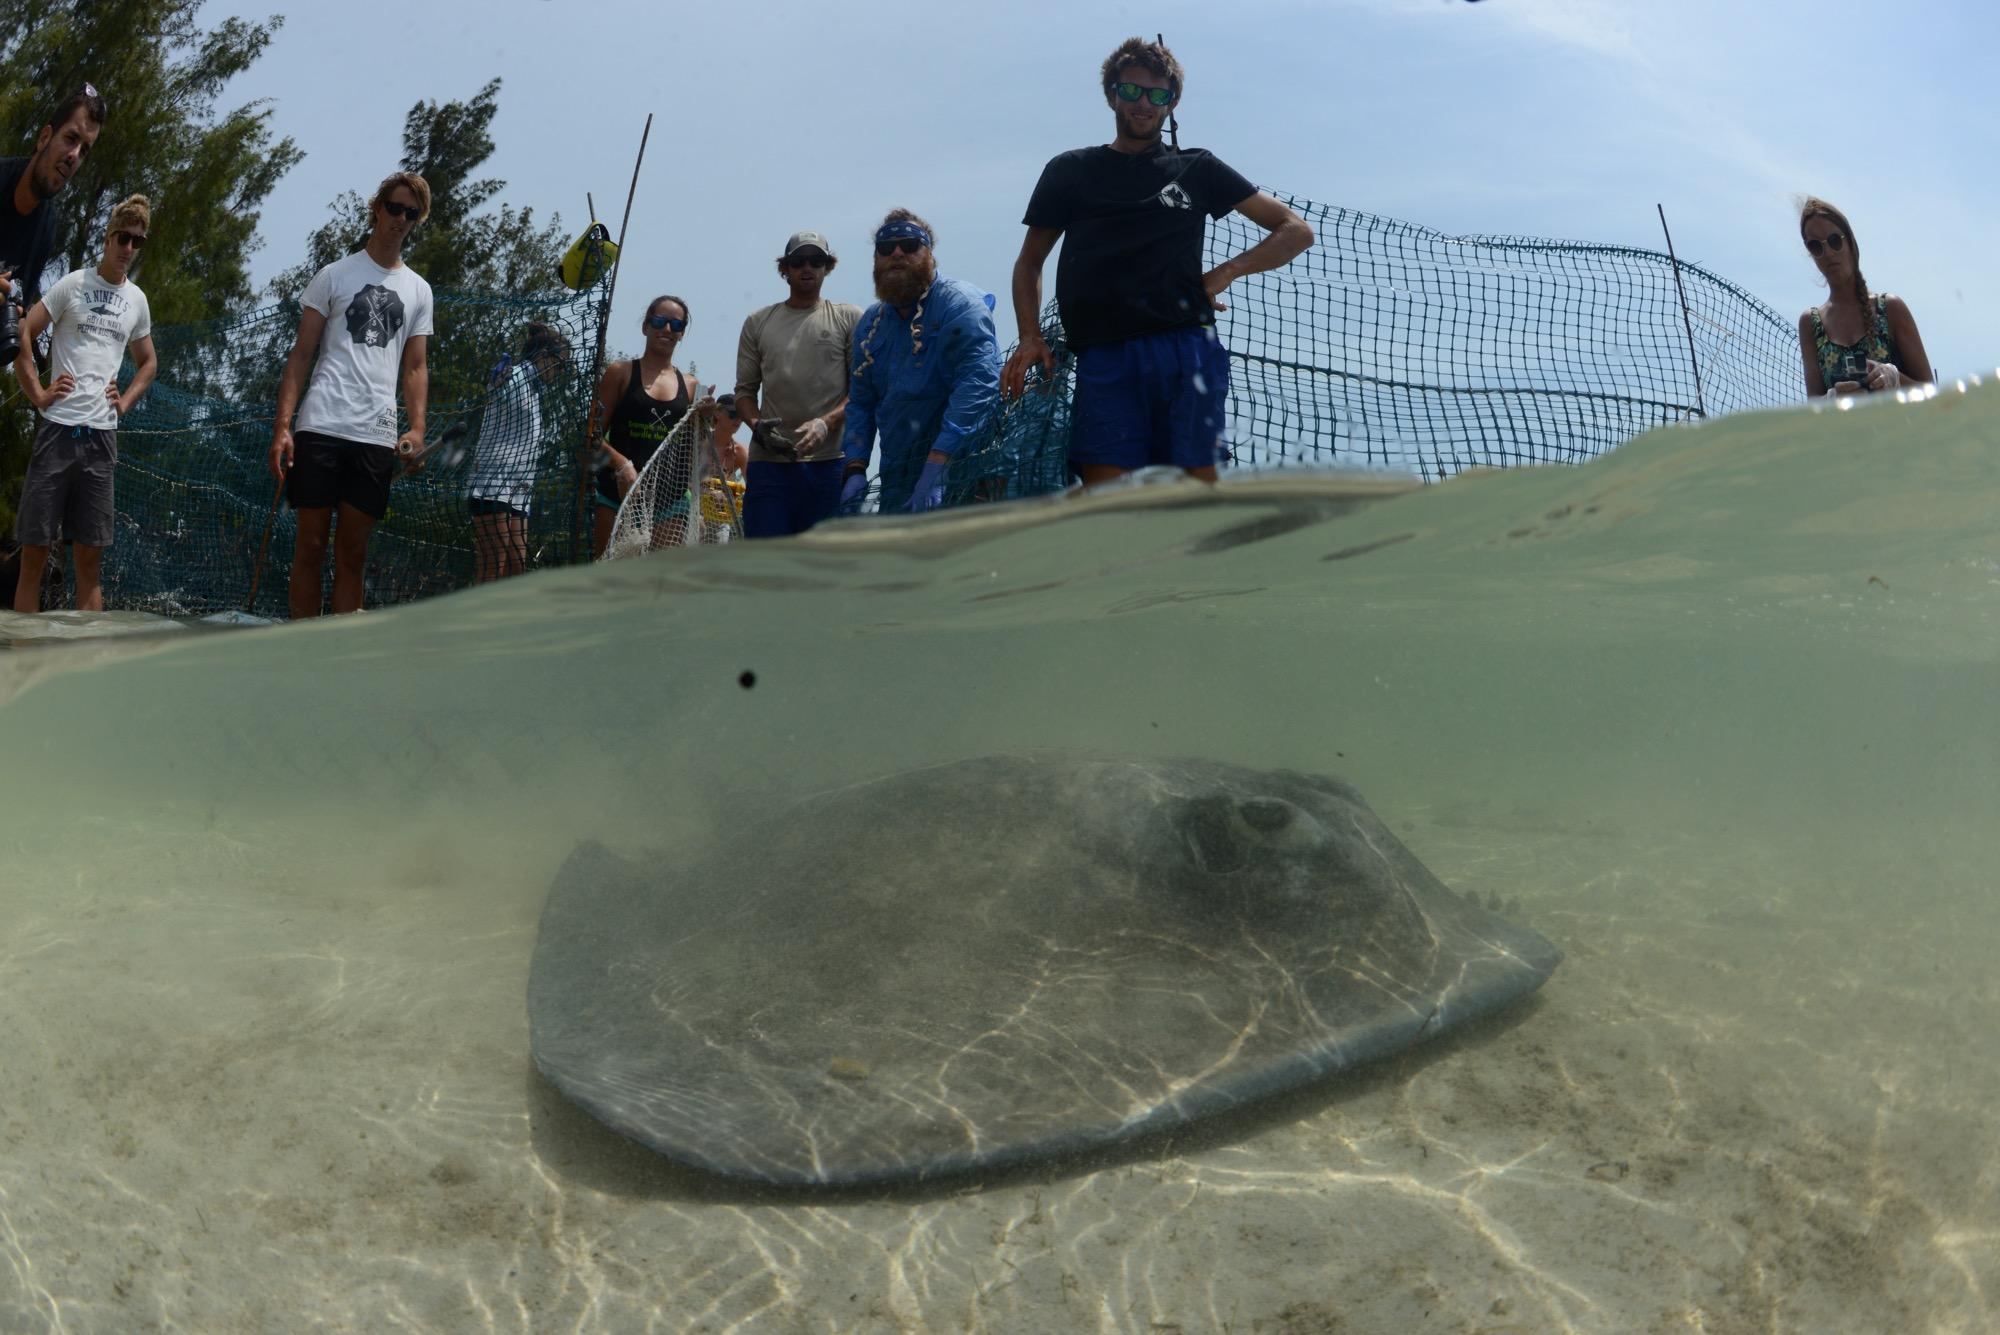 Owen instructing Shark Lab volunteers and staff on safe handling practices on stingrays.